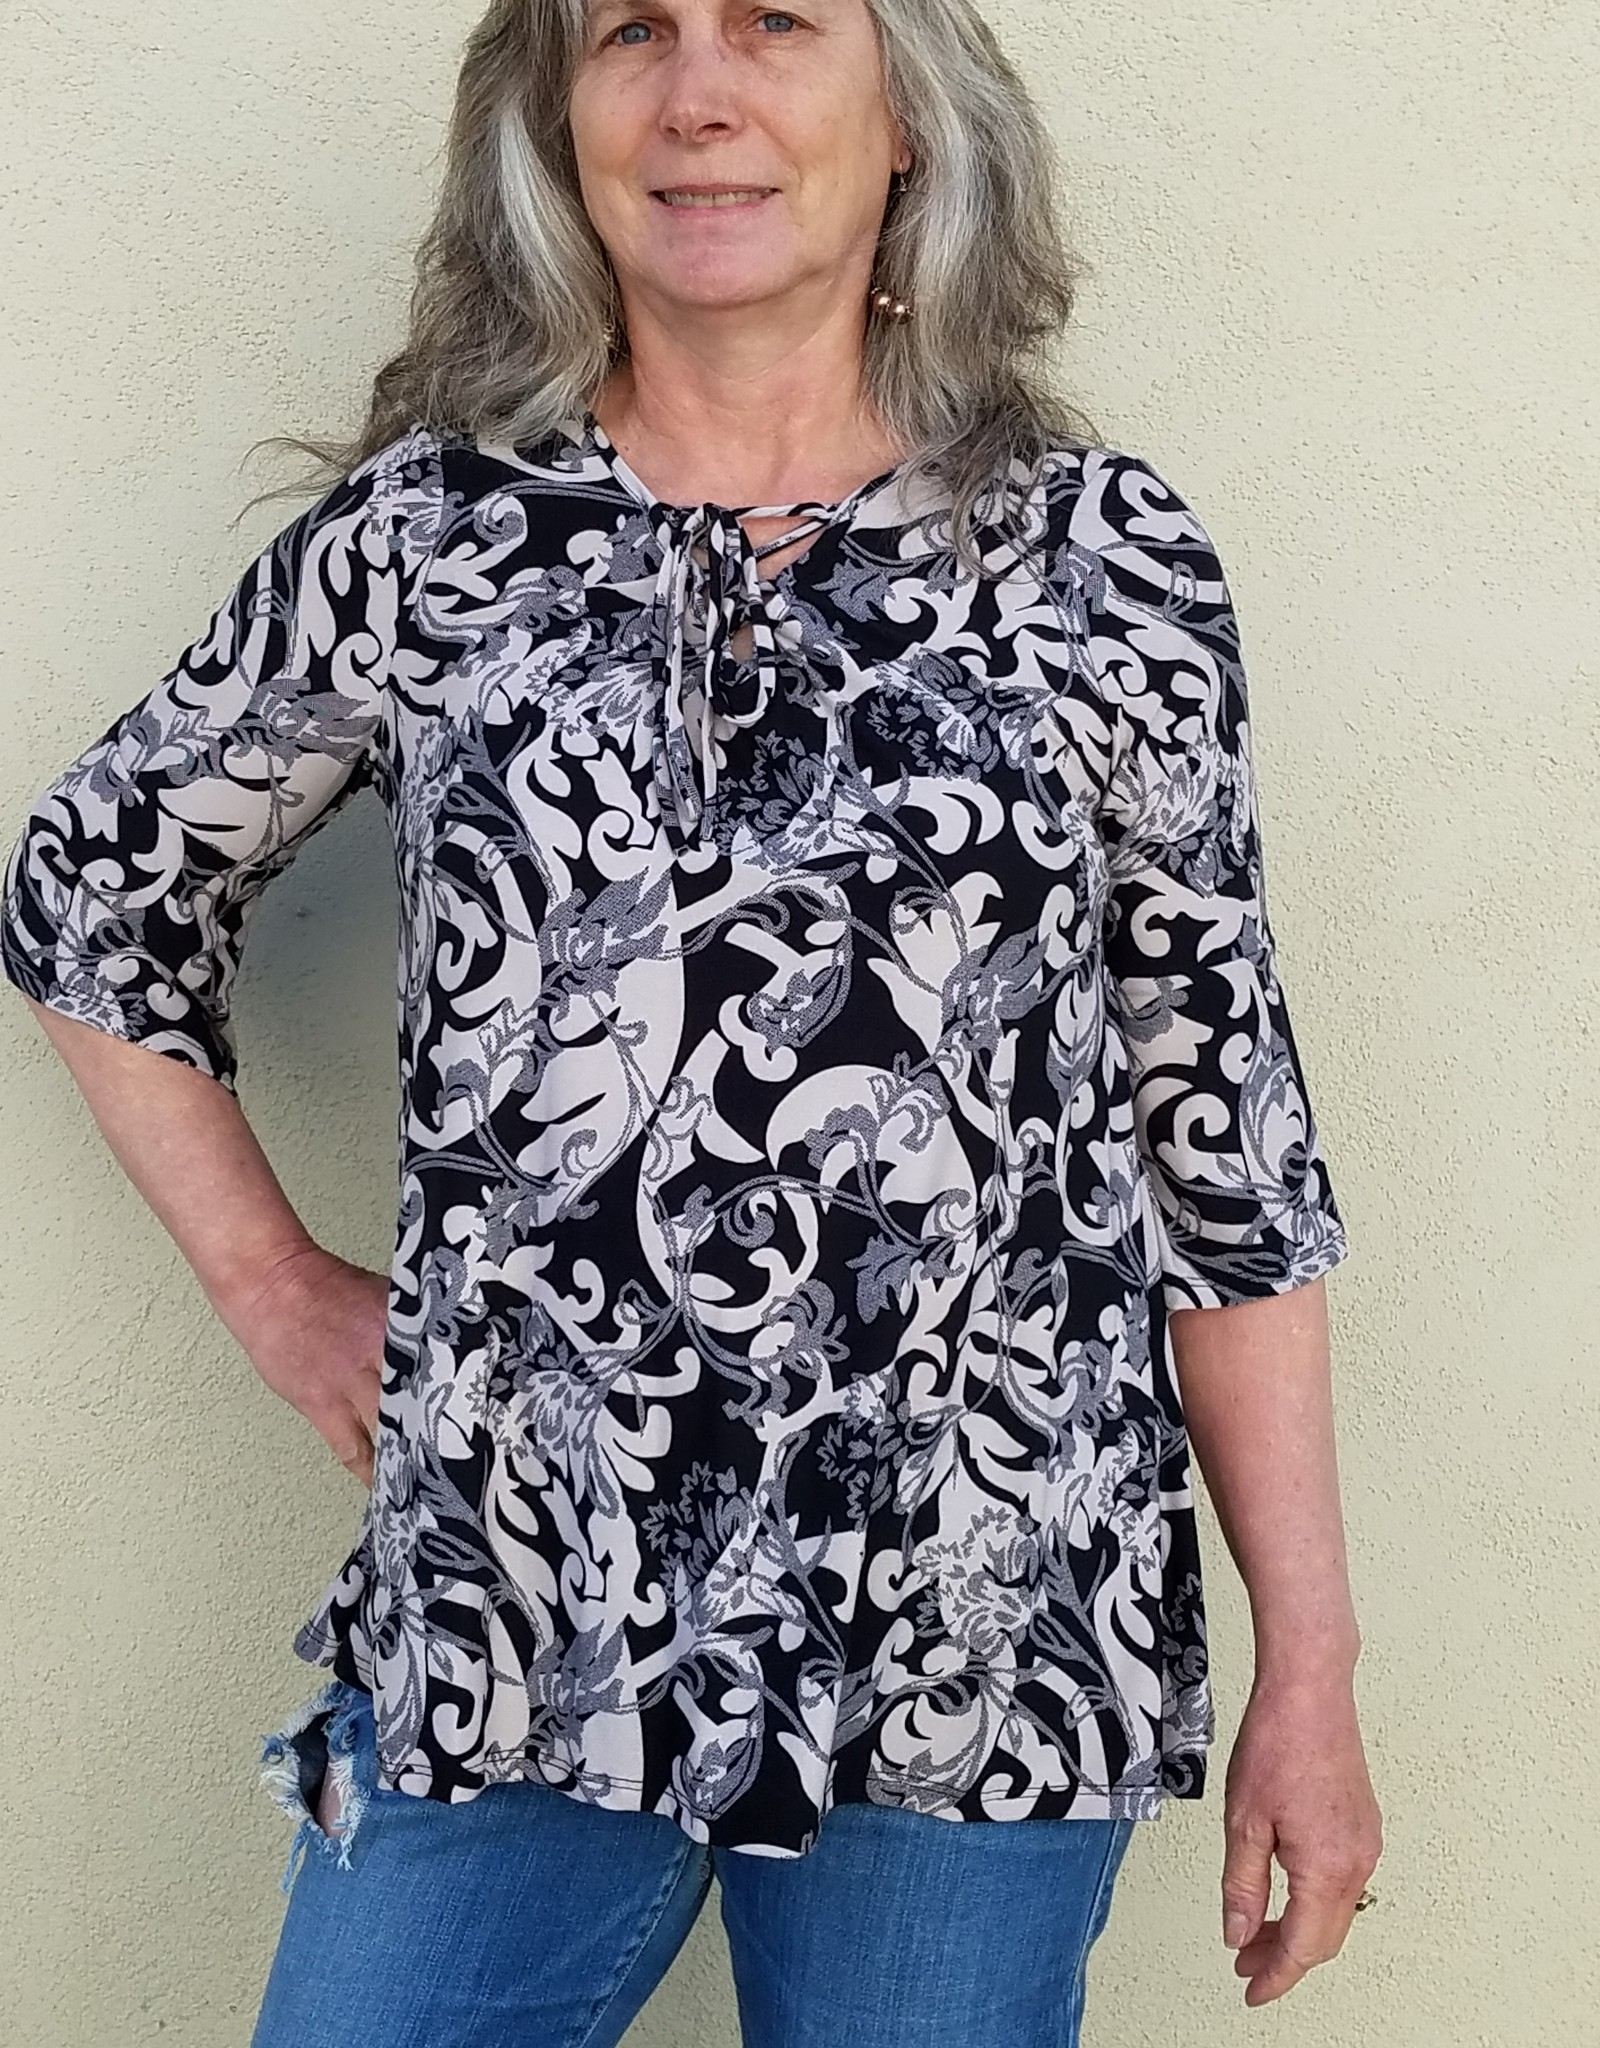 Goldspark Criss cross tie blouse